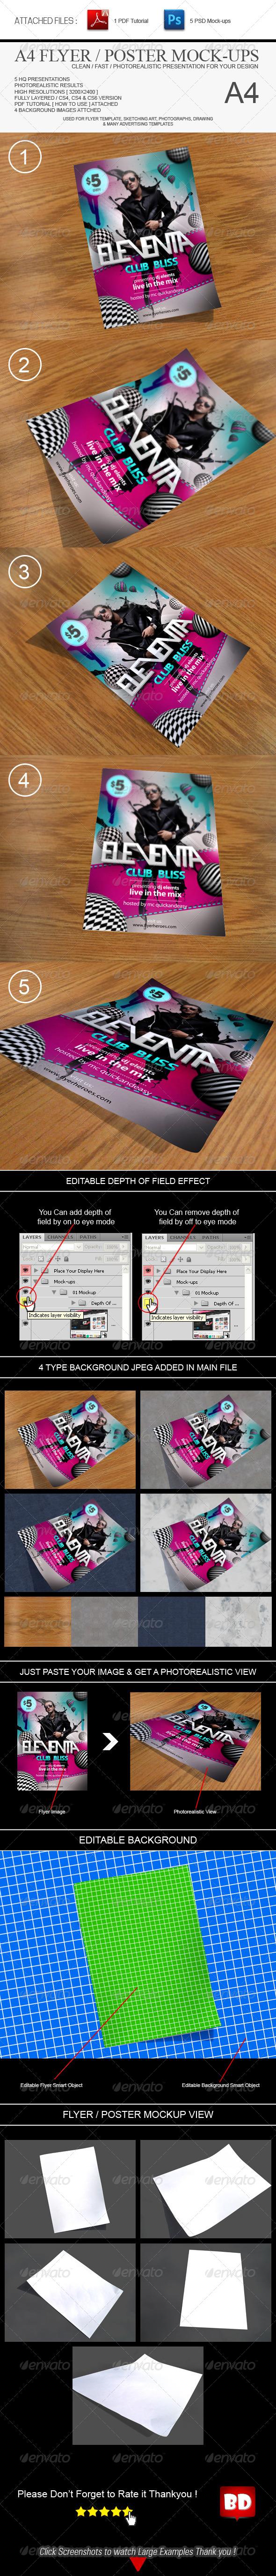 GraphicRiver A4 Flyer Mock-ups Pack 6772175